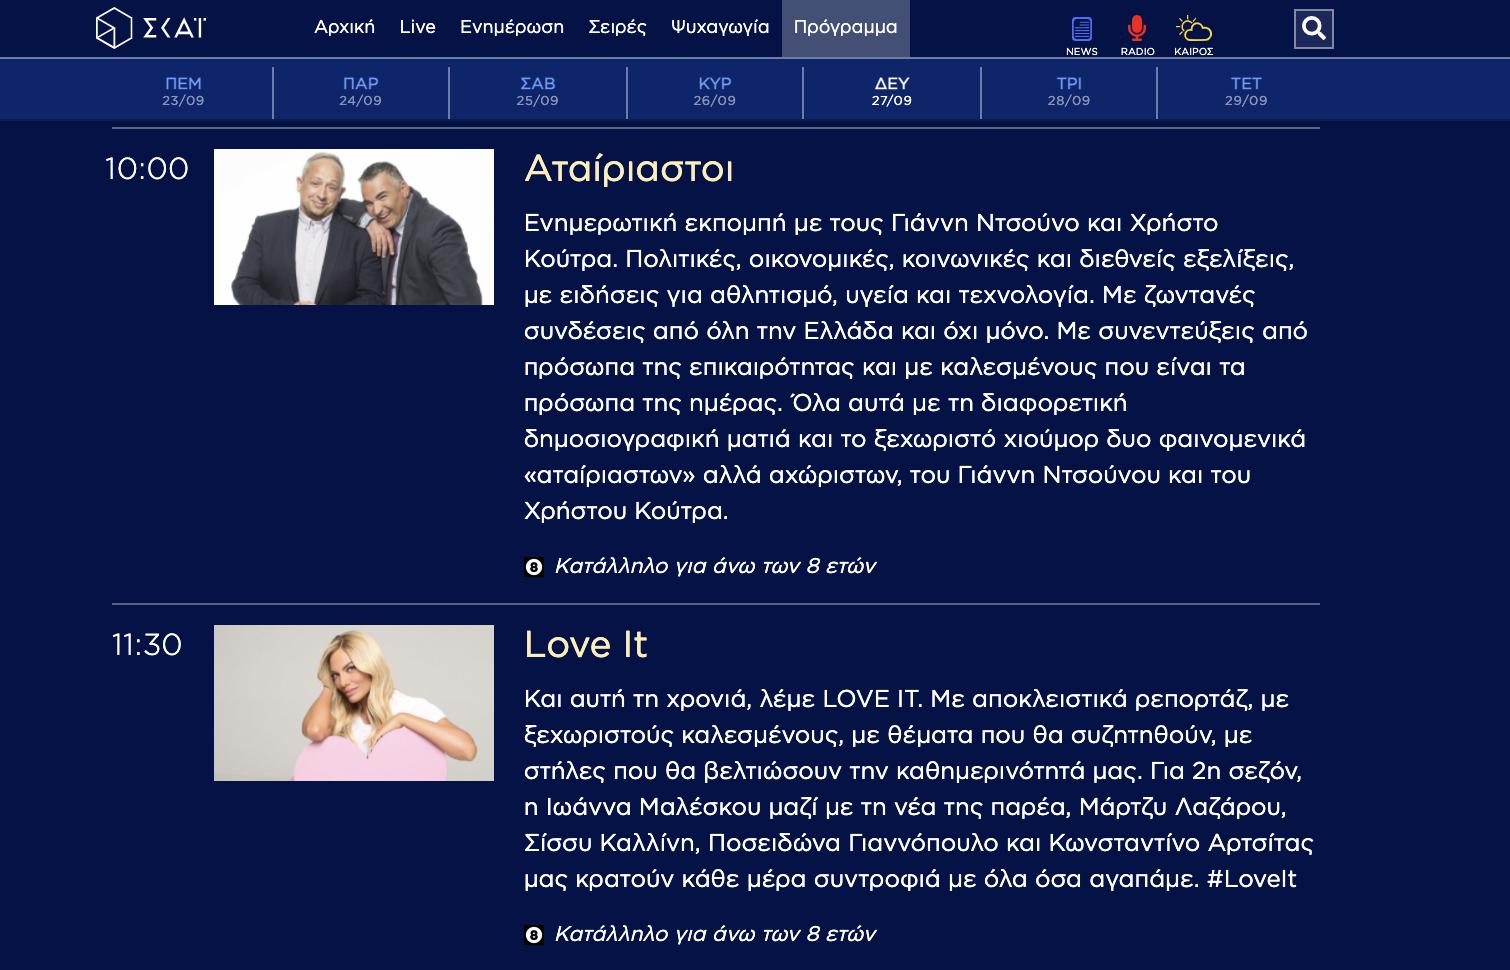 Love it   Και επίσημα αλλαγή ώρας μετάδοσης για την Ιωάννα Μαλέσκου